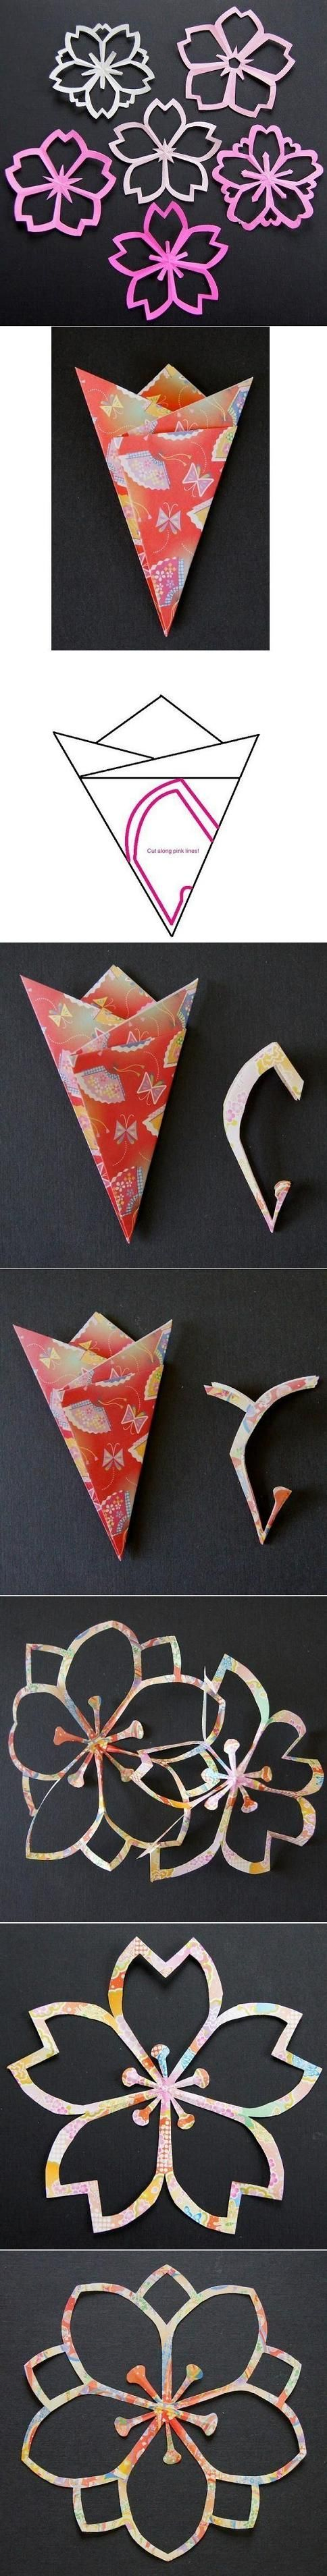 DIY Flower Paper Cutting